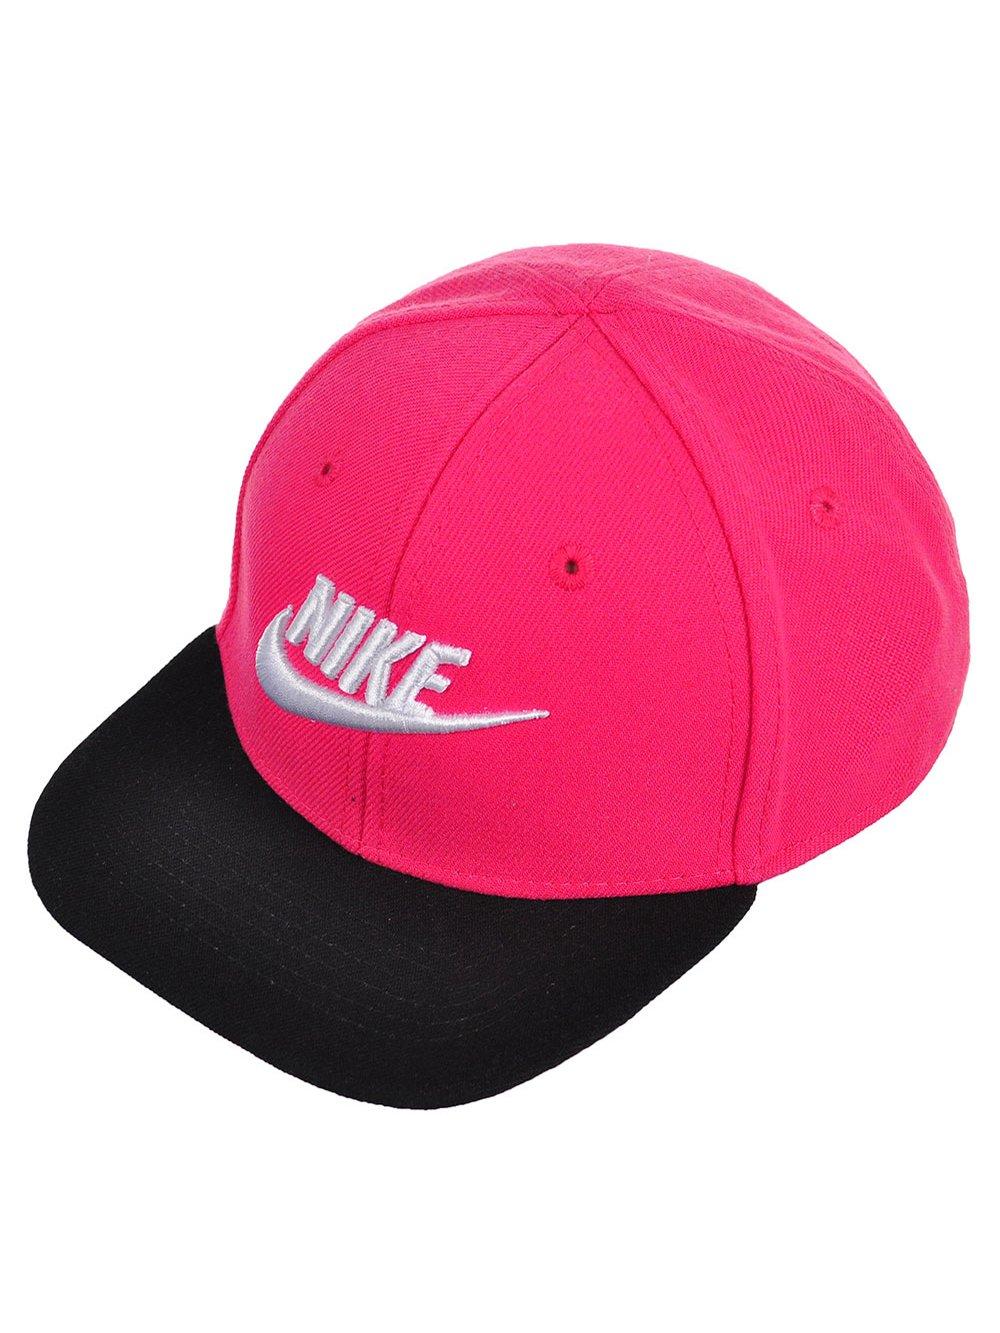 Nike Baby Girls' Snapback Cap - vivid pink/black, 12-24 months